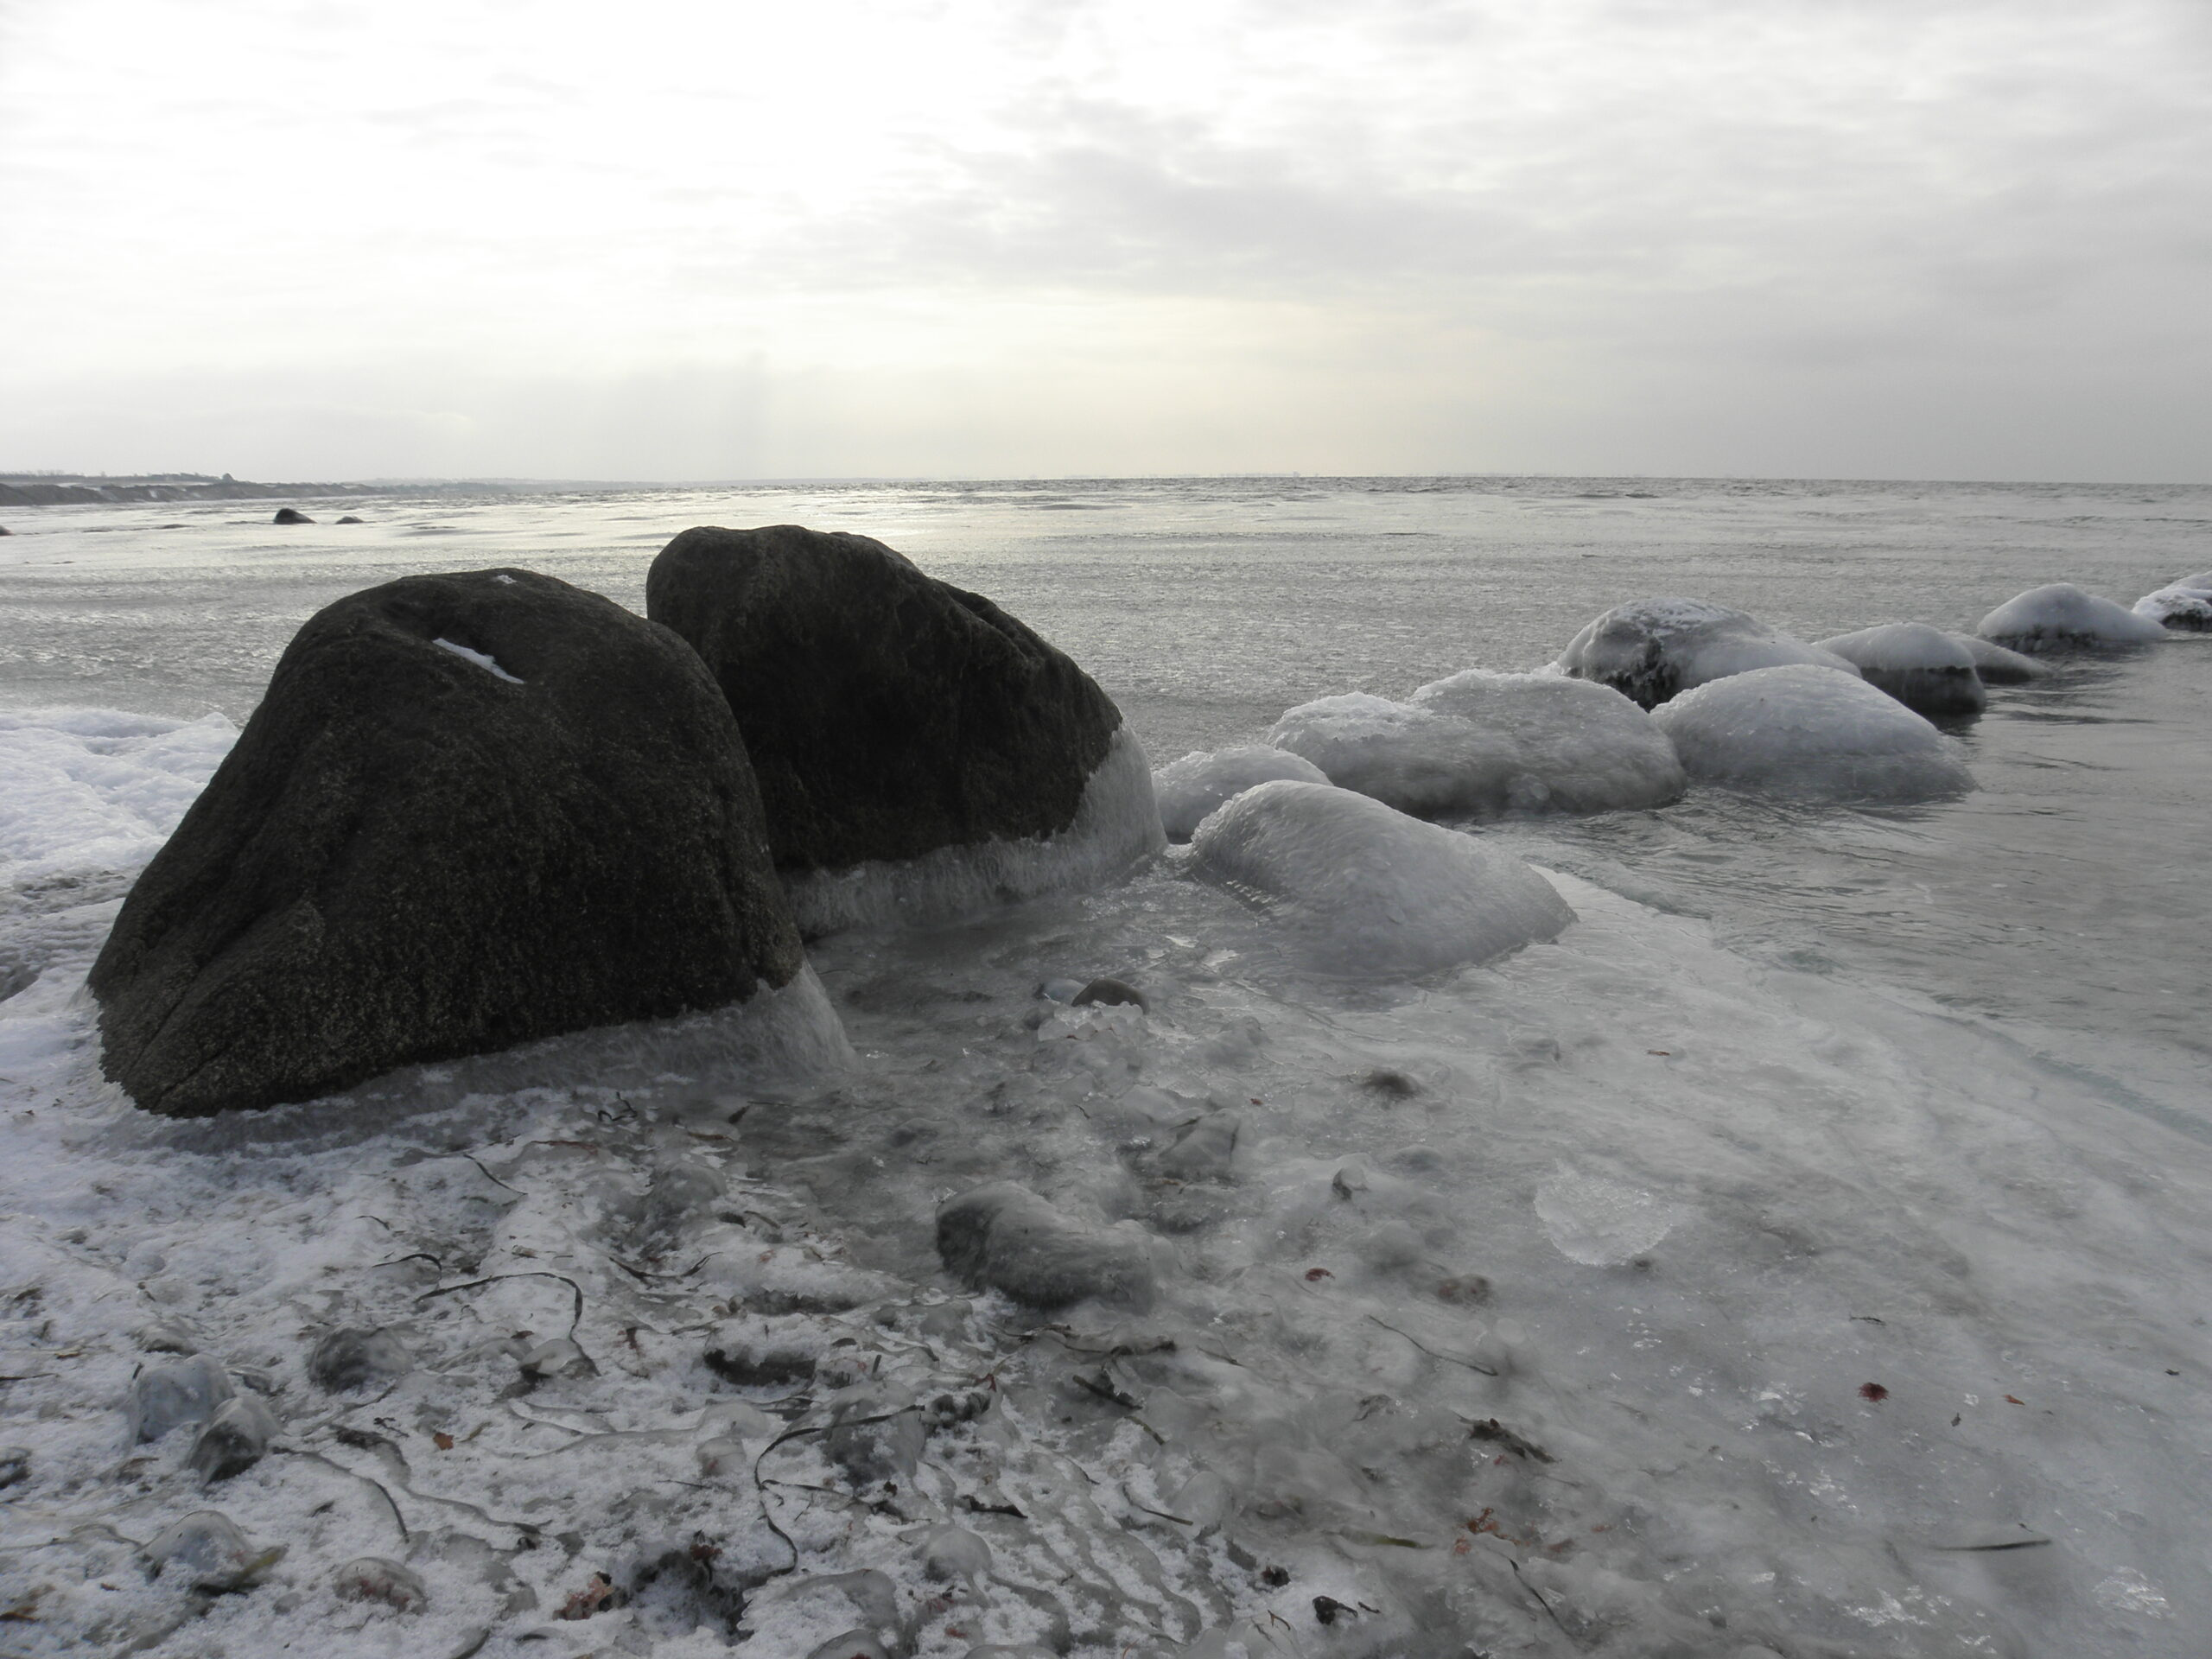 2012 - Vinter på Orø